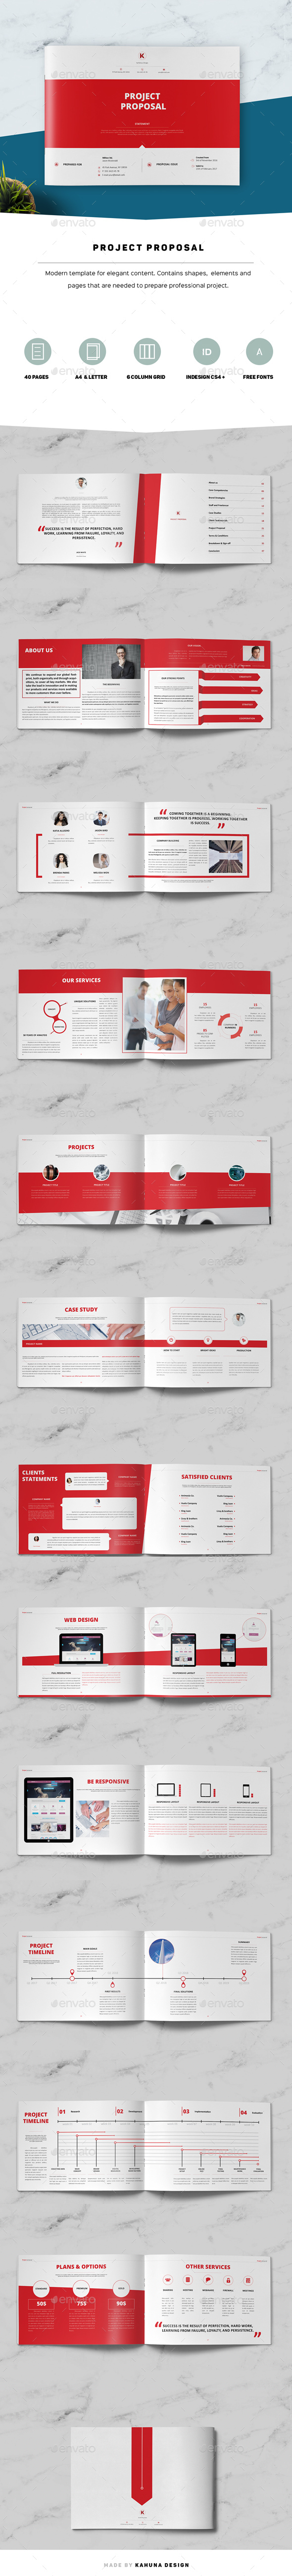 Project Proposal Landscape - Informational Brochures